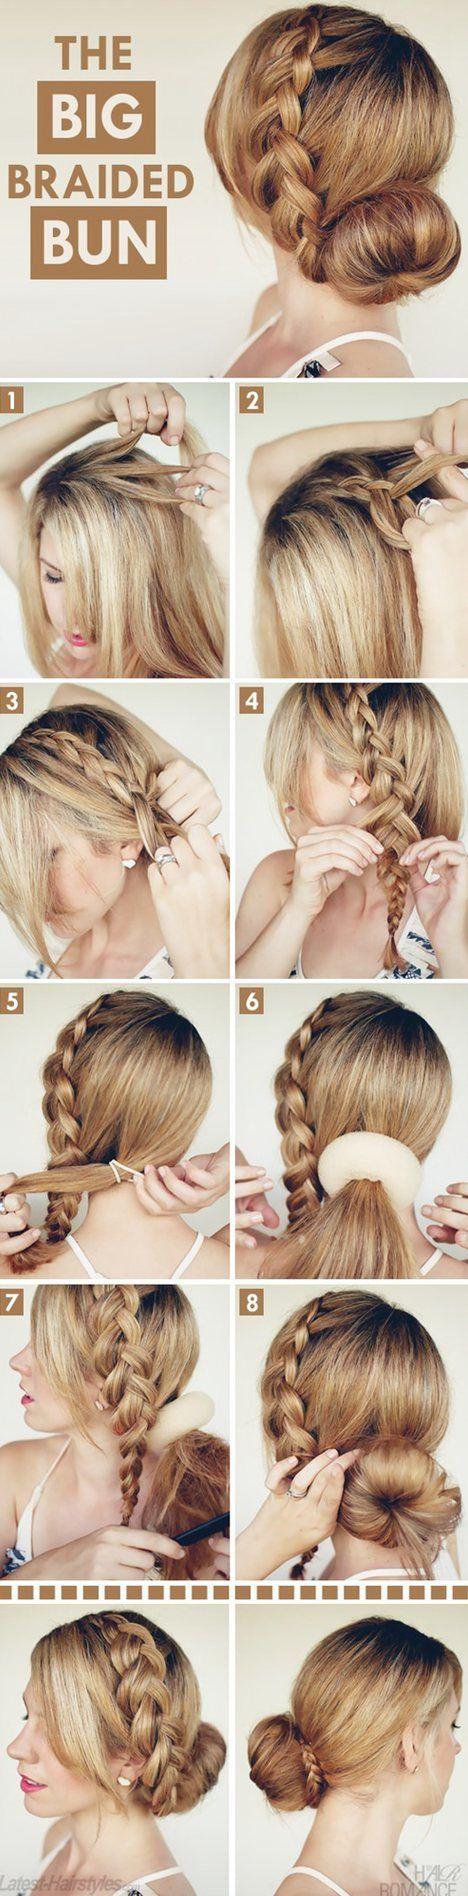 Magnificent 1000 Ideas About Medium Hair Tutorials On Pinterest Side Bangs Short Hairstyles Gunalazisus